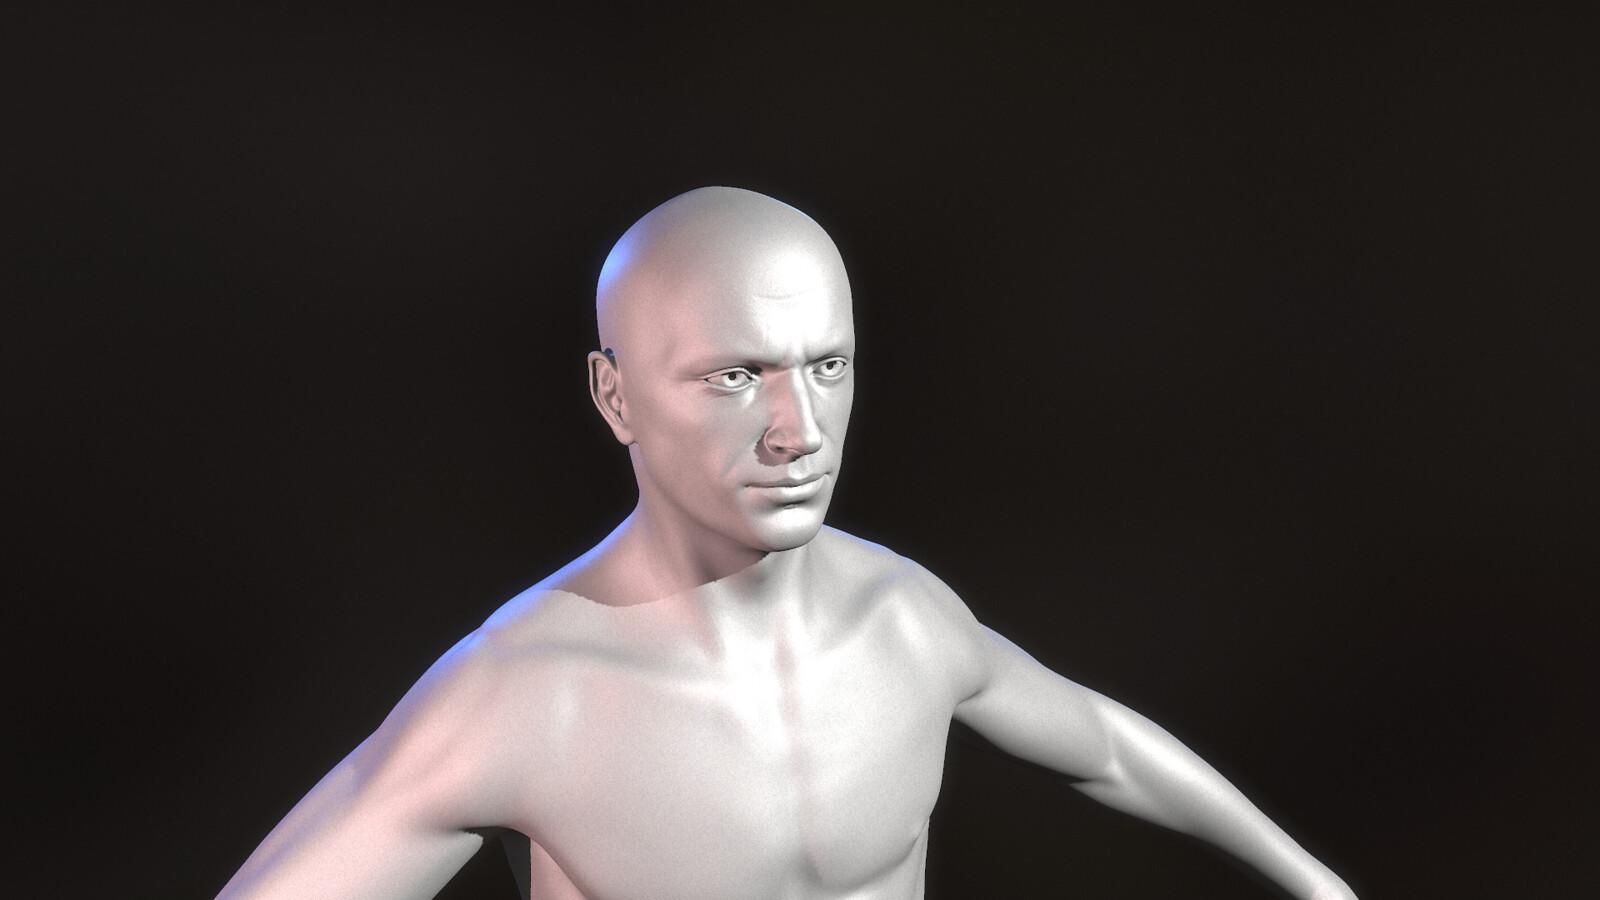 High Poly Head